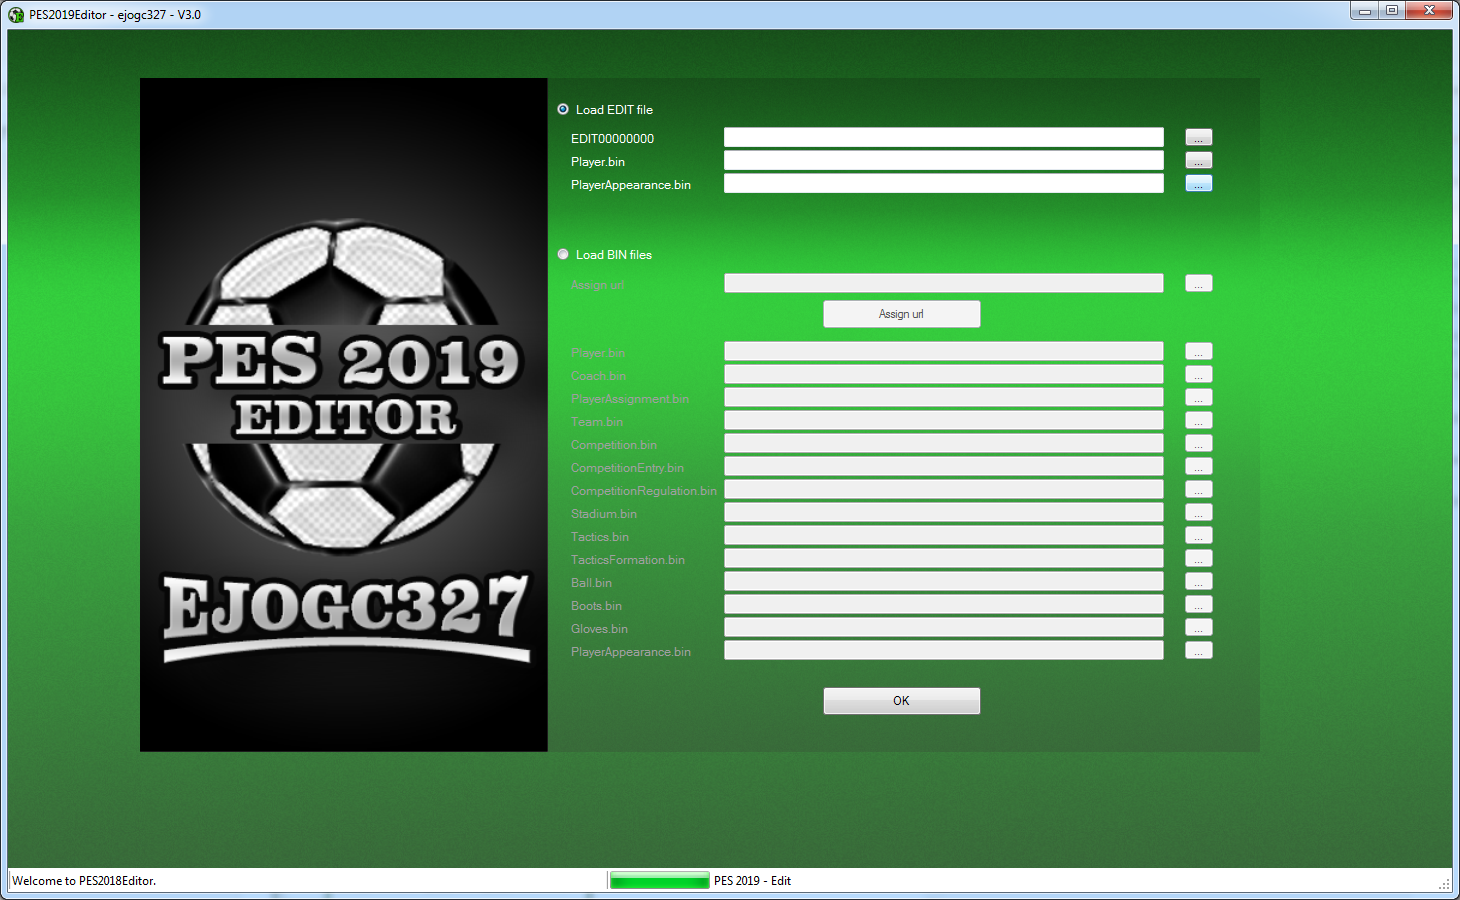 ejogc327: PES 2019 Editor V3 0